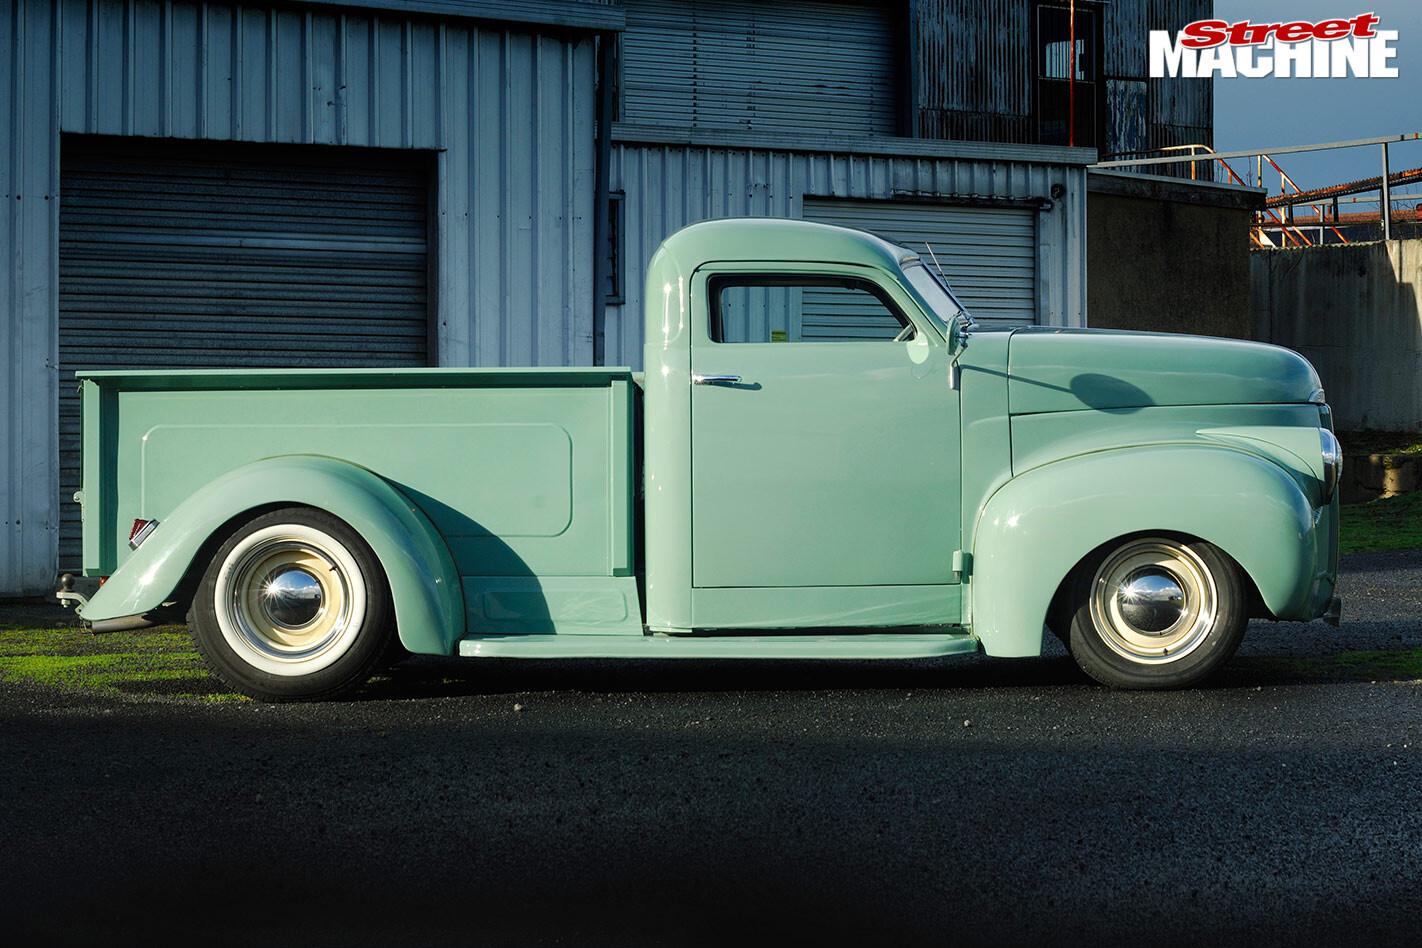 1948 Studebaker M5 pickup side